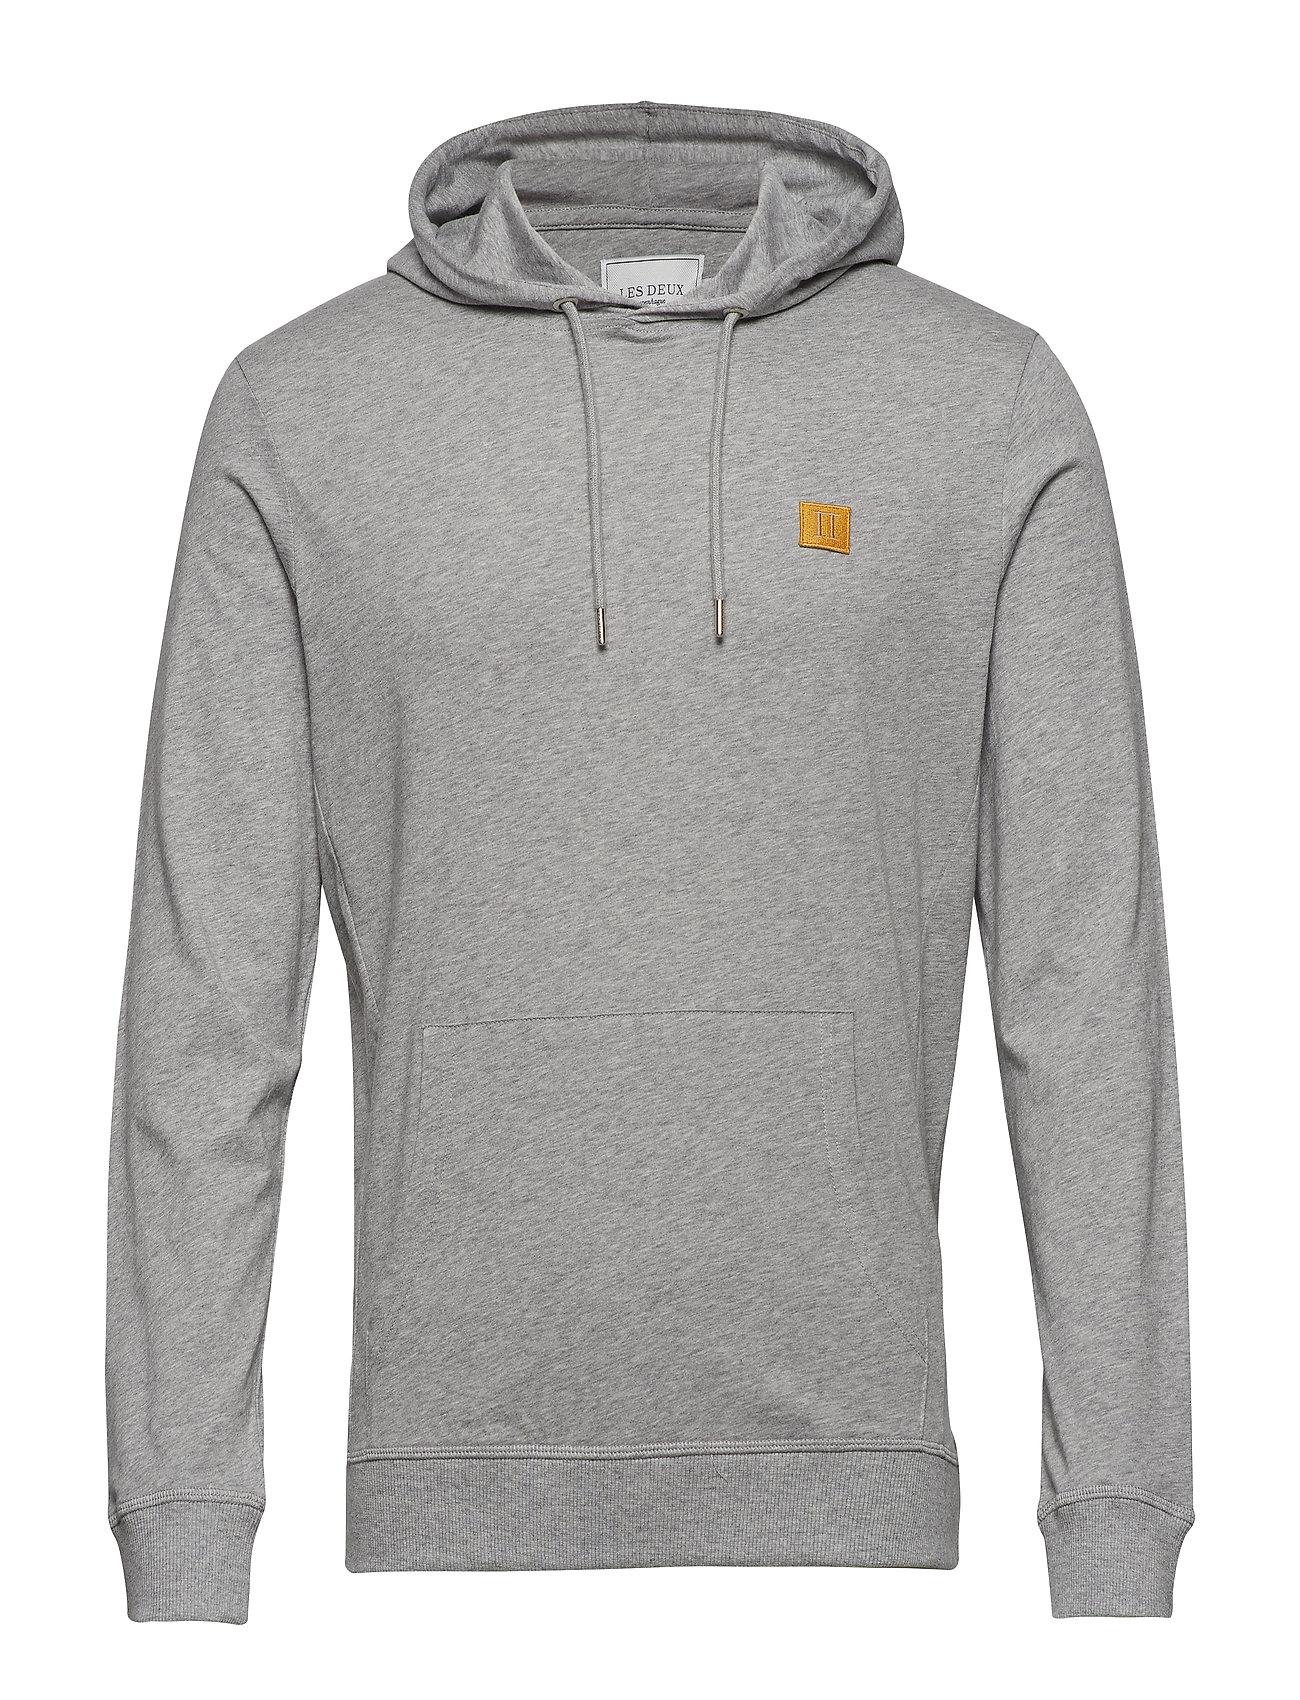 Les Deux Boozt T-shirt Hoodie - GREY MELANGE